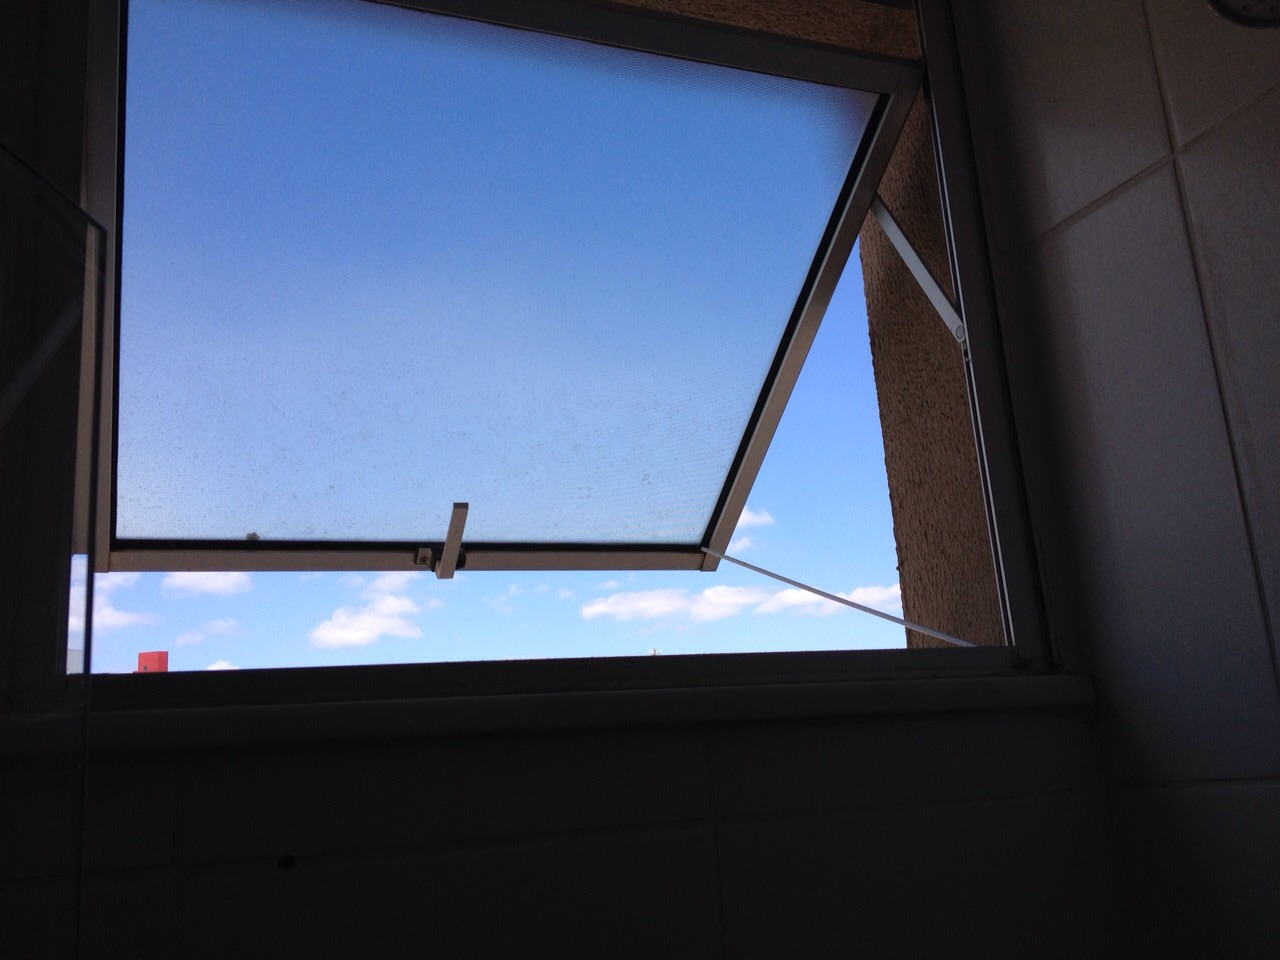 #095DC2 janela máximo ar perfil de janela acessório janela integrada fecho 4092 Fecho Tipo Orelha Para Janela De Aluminio De Correr